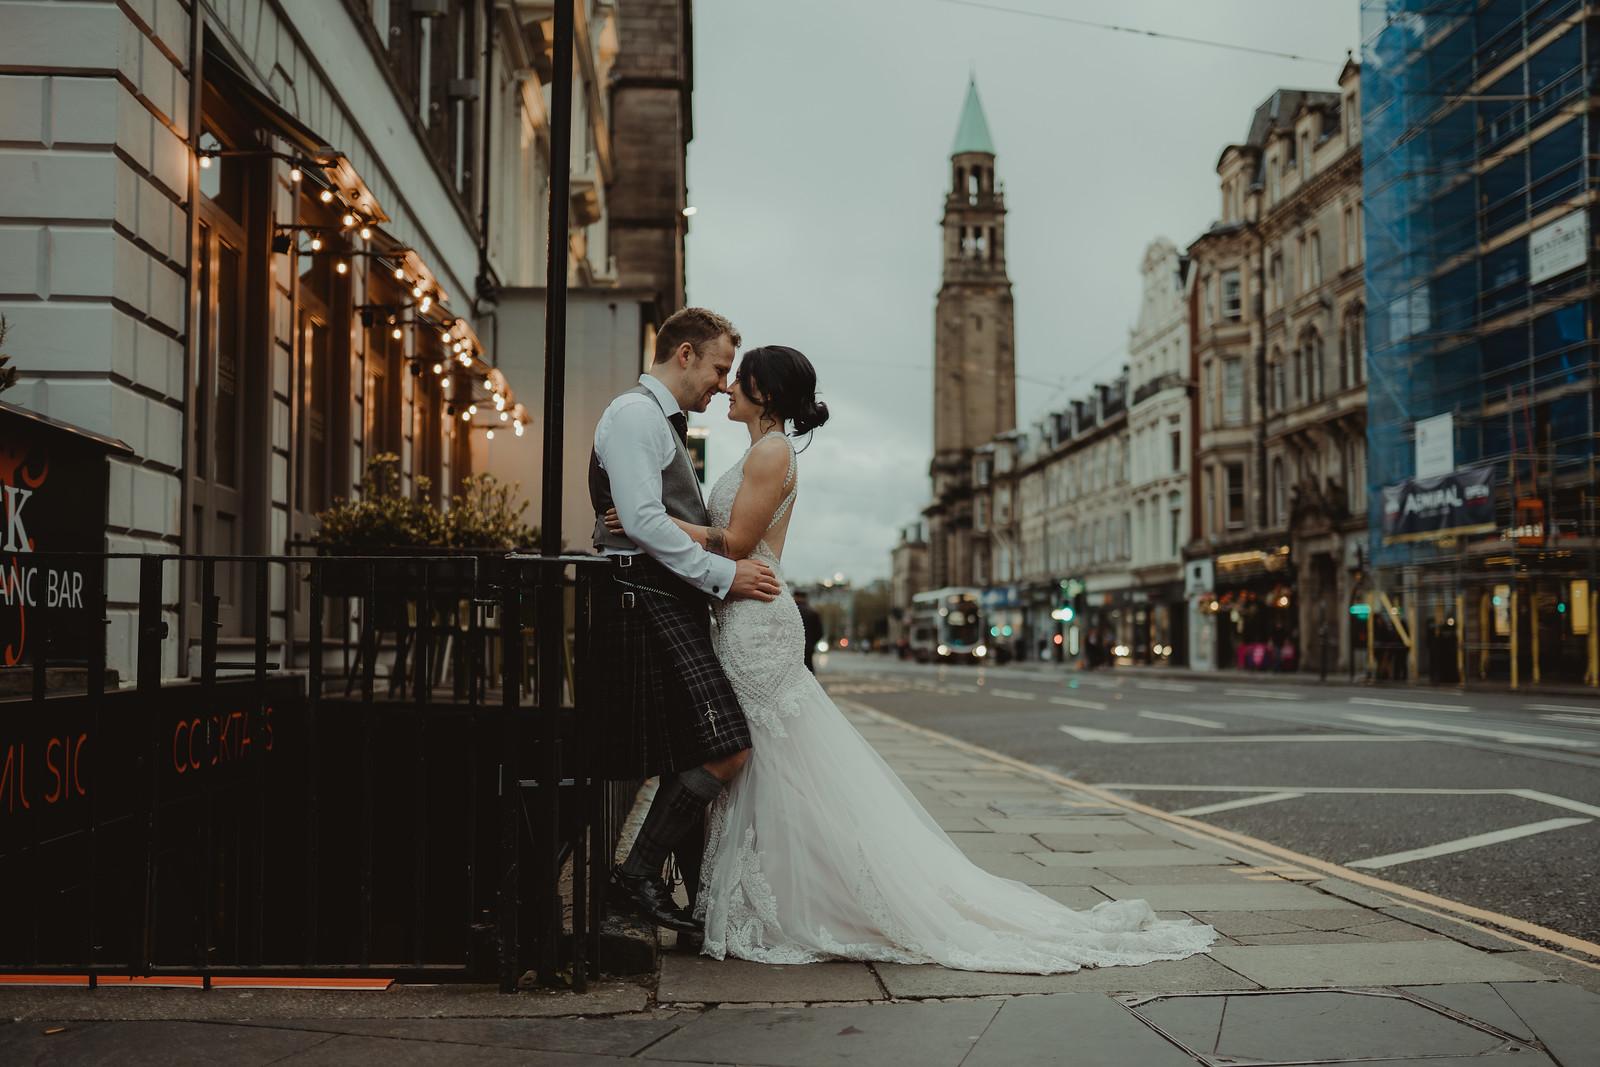 Bride and groom wedding photo within a street in Edinburgh